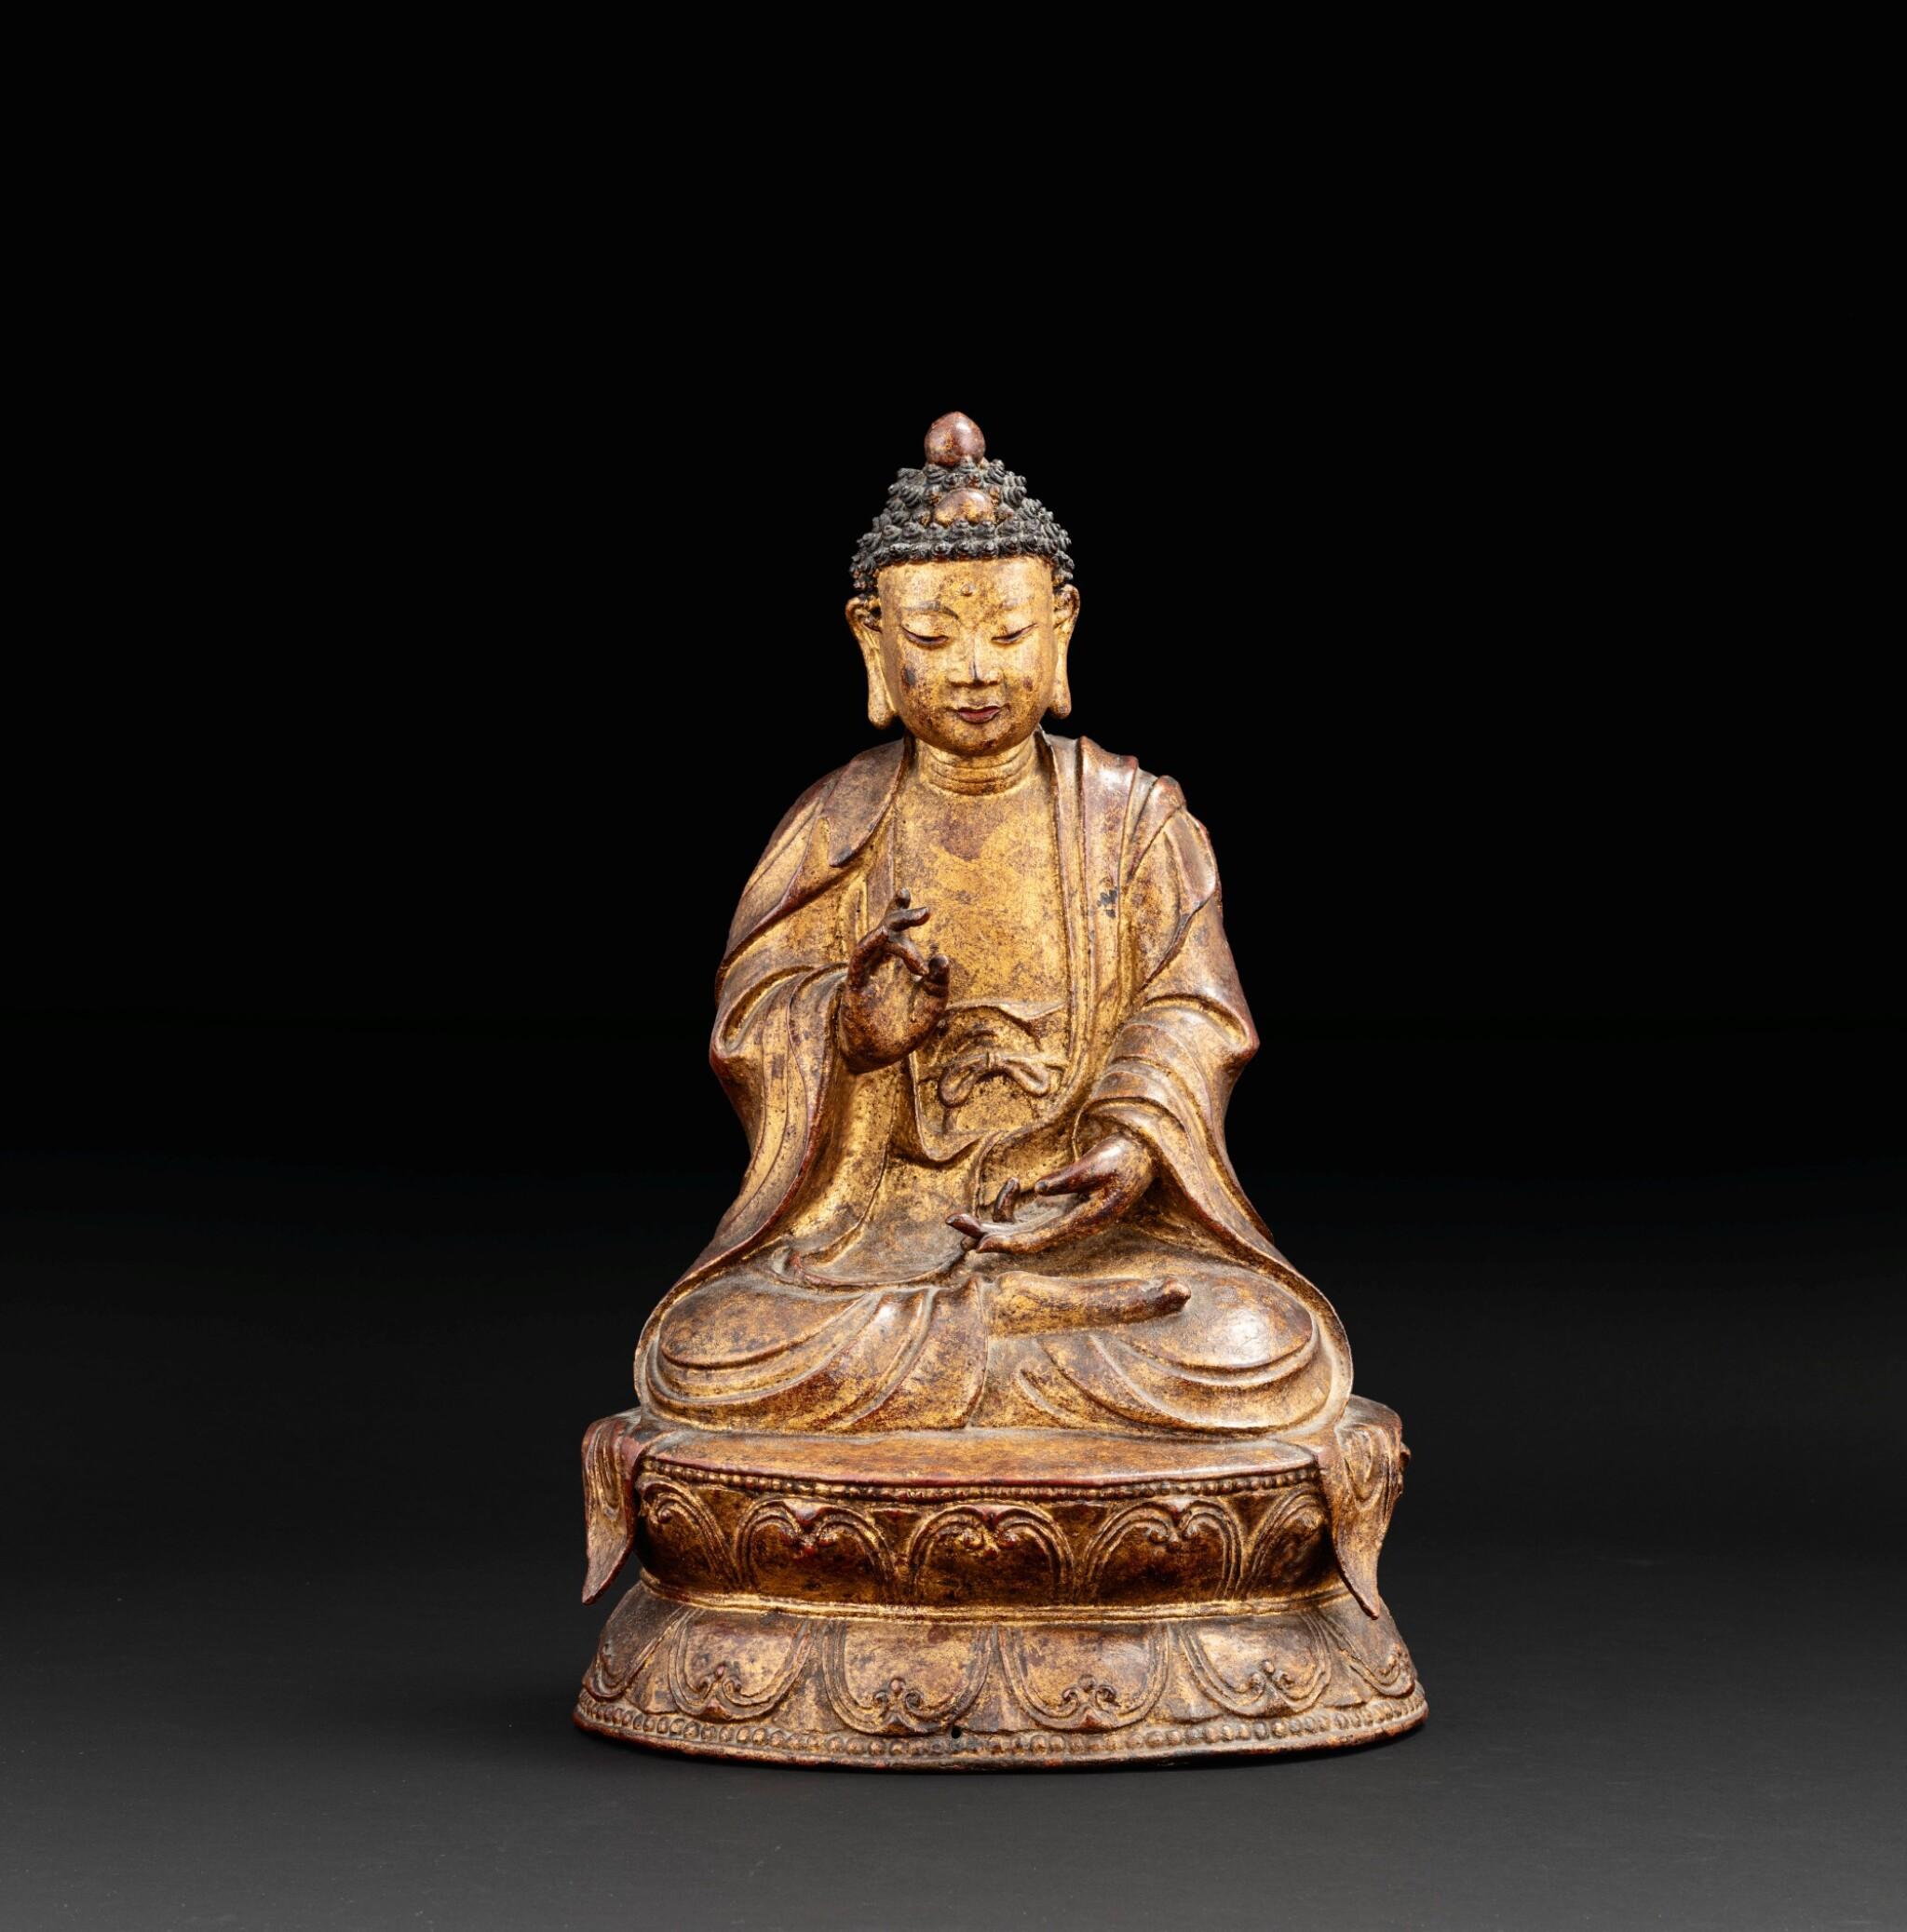 View 1 of Lot 51. Grande Statue de Bouddha en bronze laqué doré Probablement fin de la dynastie Ming, XVIE-XVIIE siècle | 或為明十六至十七世紀 漆金佛坐像 | A large lacquer-gilt bronze figure of Buddha, probably Ming Dynasty, 16th-17th century.